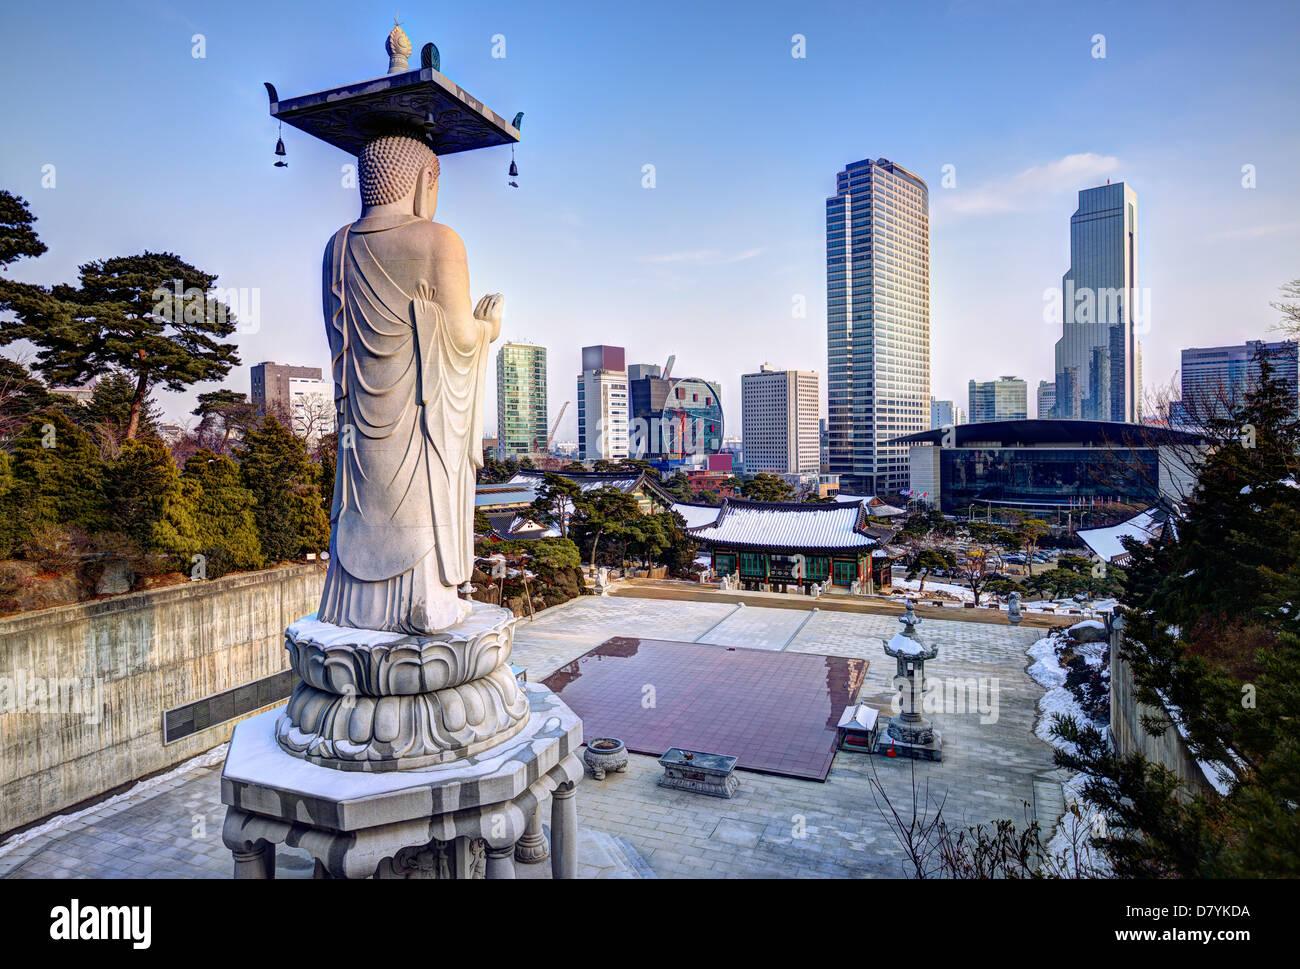 Perfil del centro de la ciudad de Seúl, Corea del Sur el Templo Bongeunsa Imagen De Stock